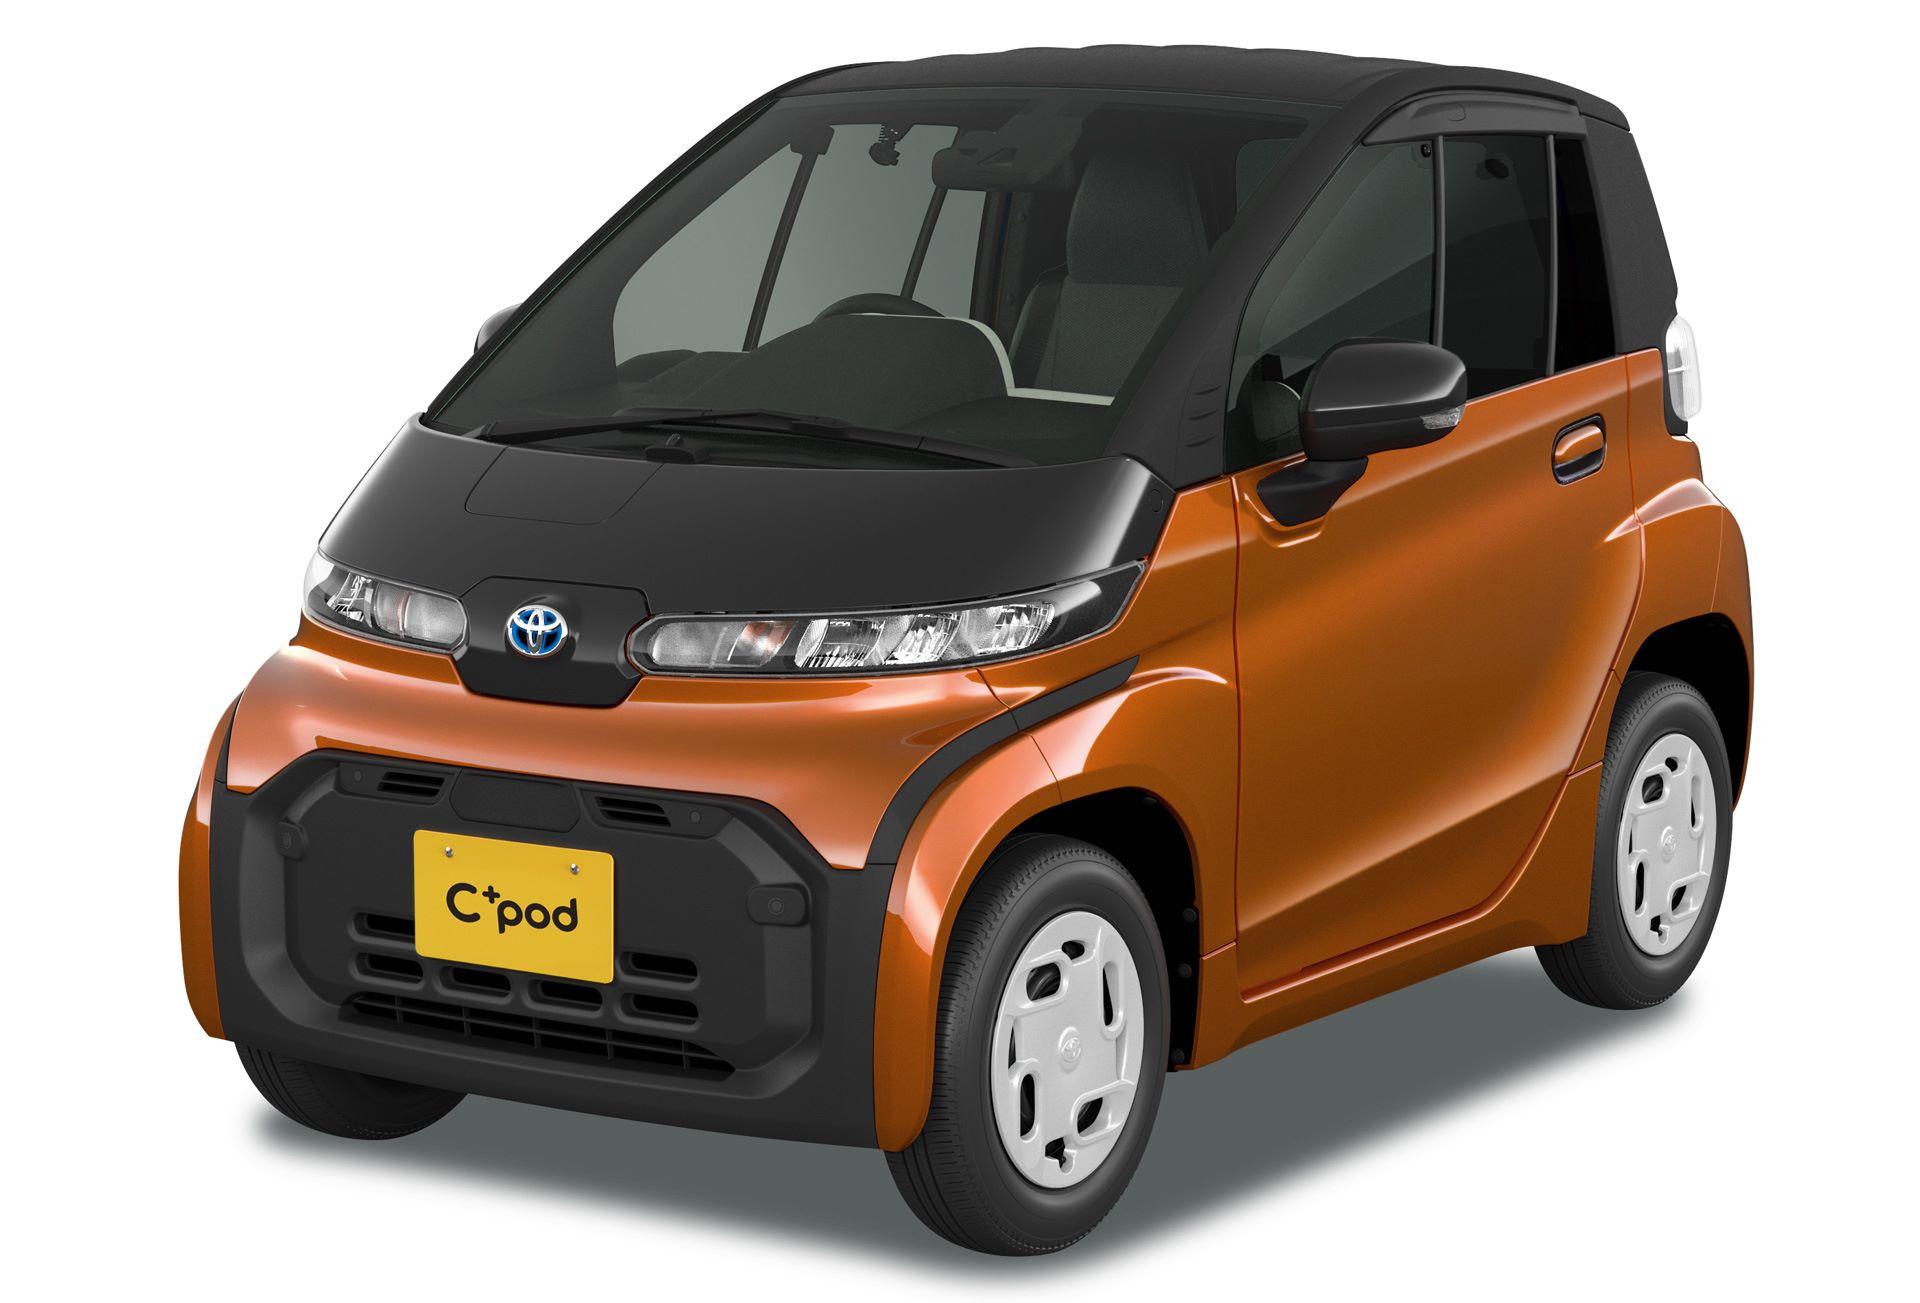 Toyota-C-pod-17